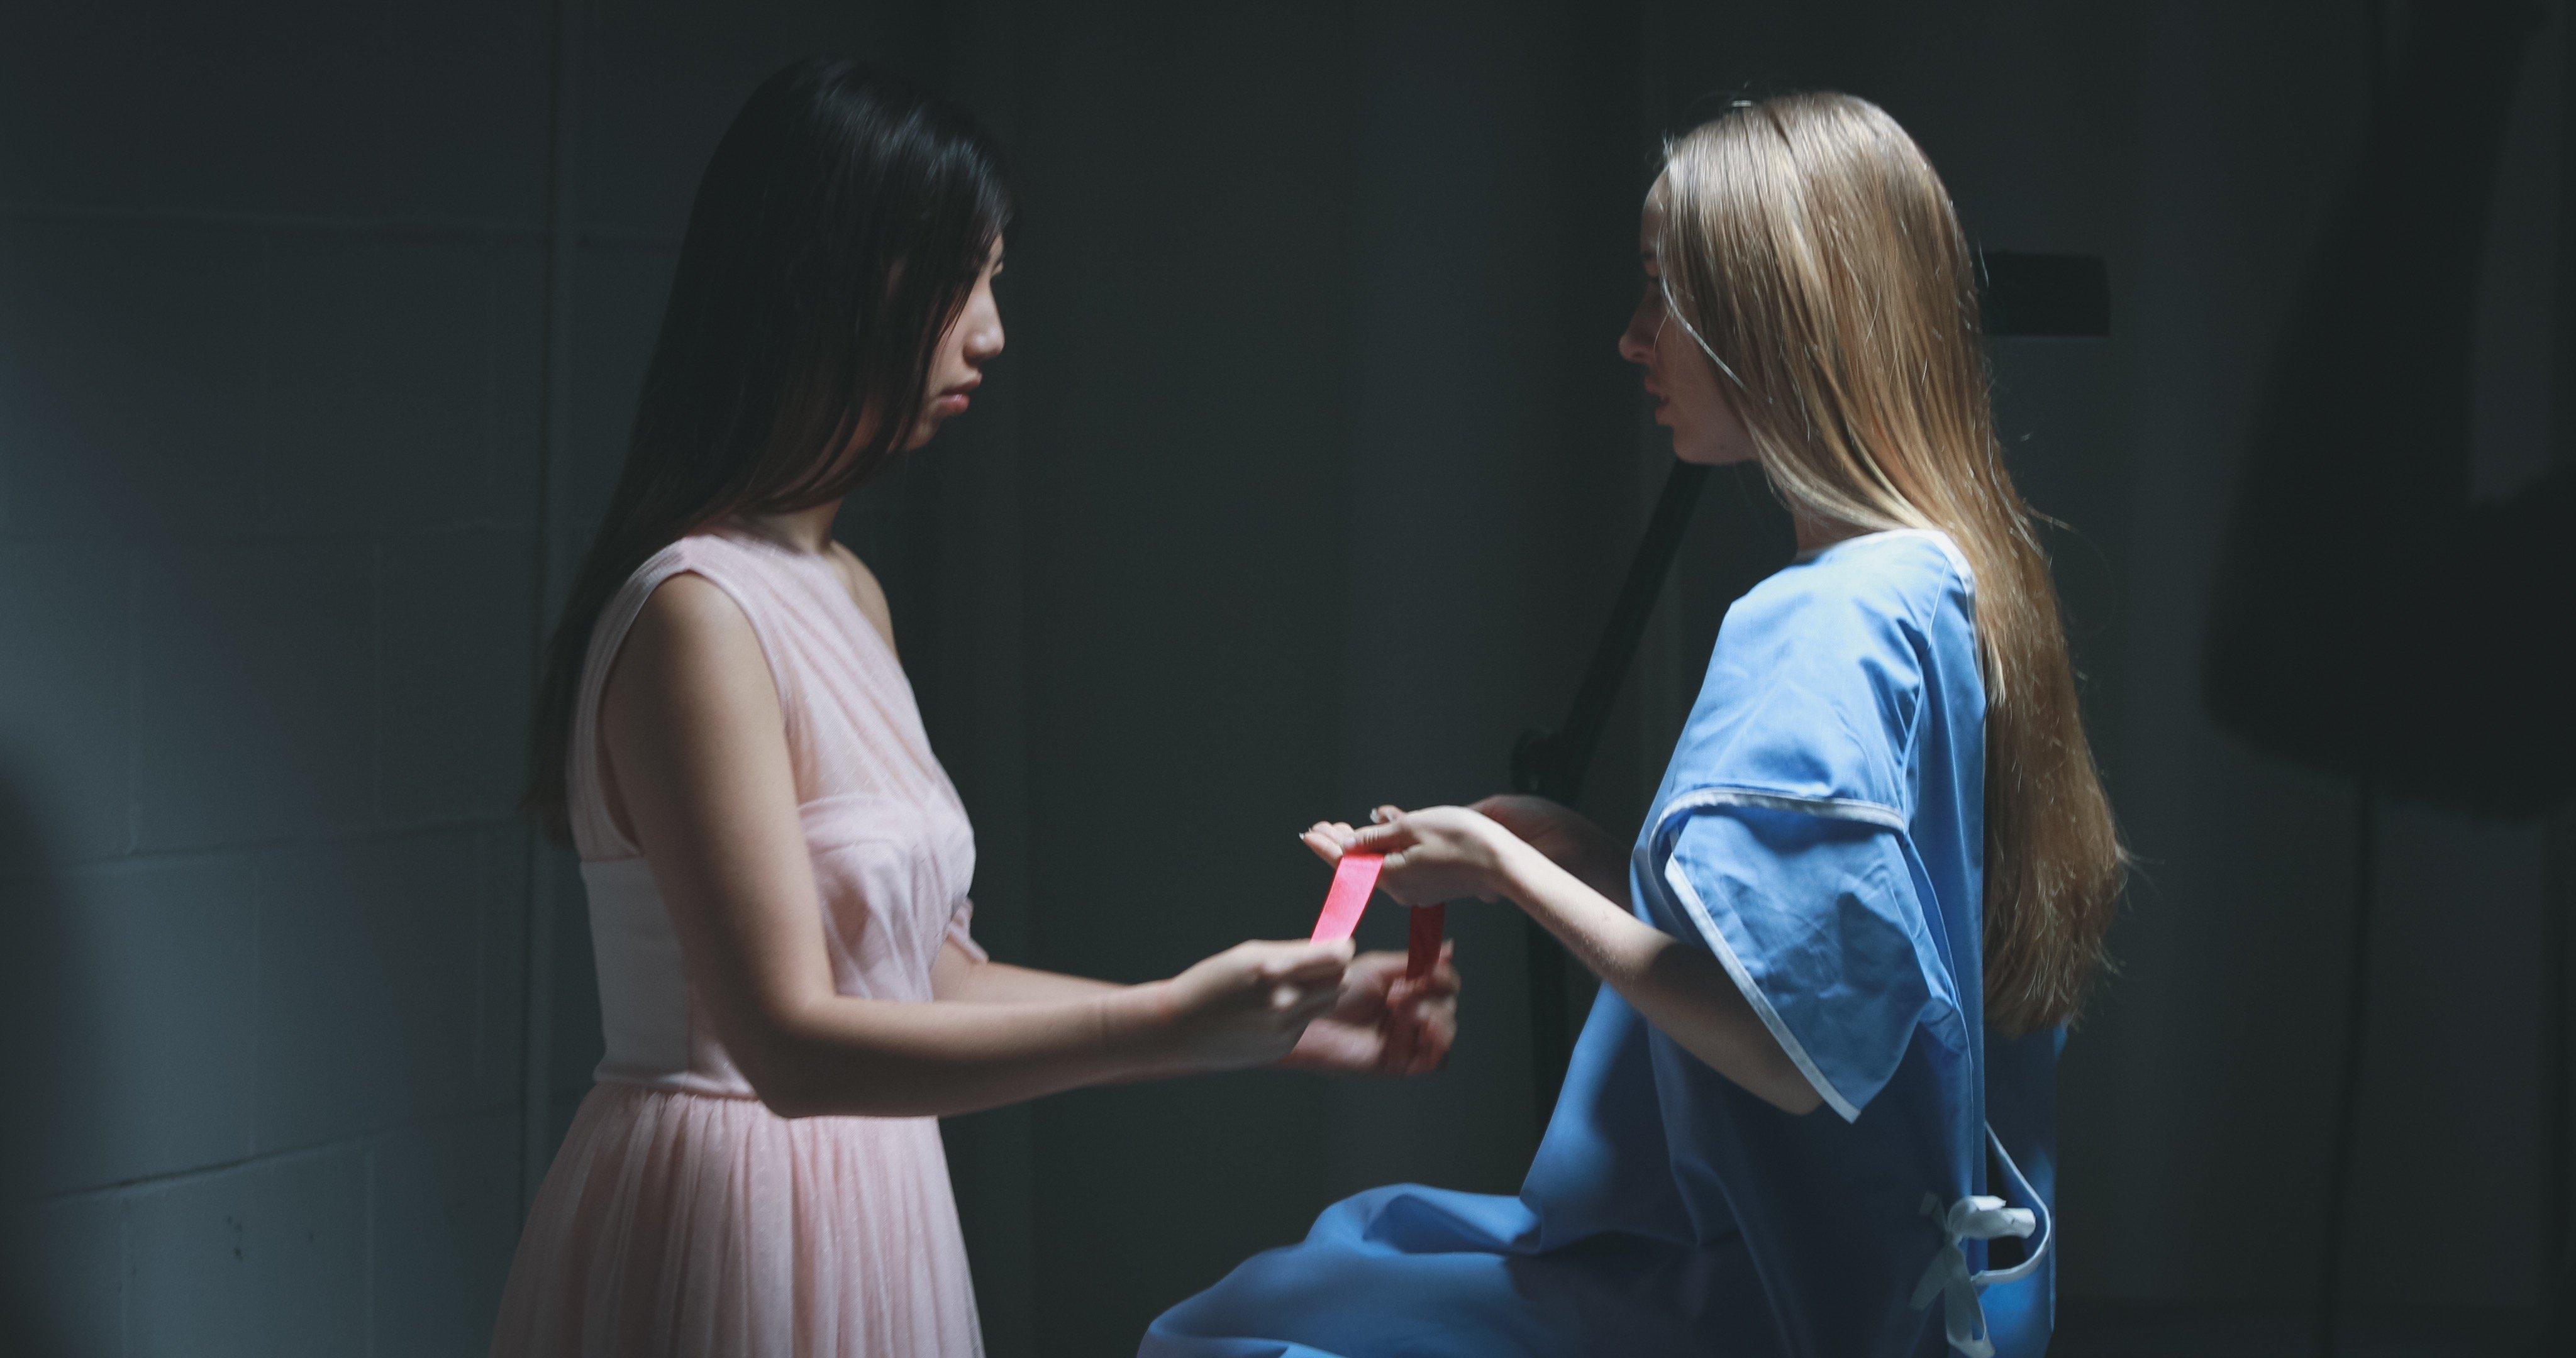 Emily Haigh and Linda Louise Duan in Beautified (2018)